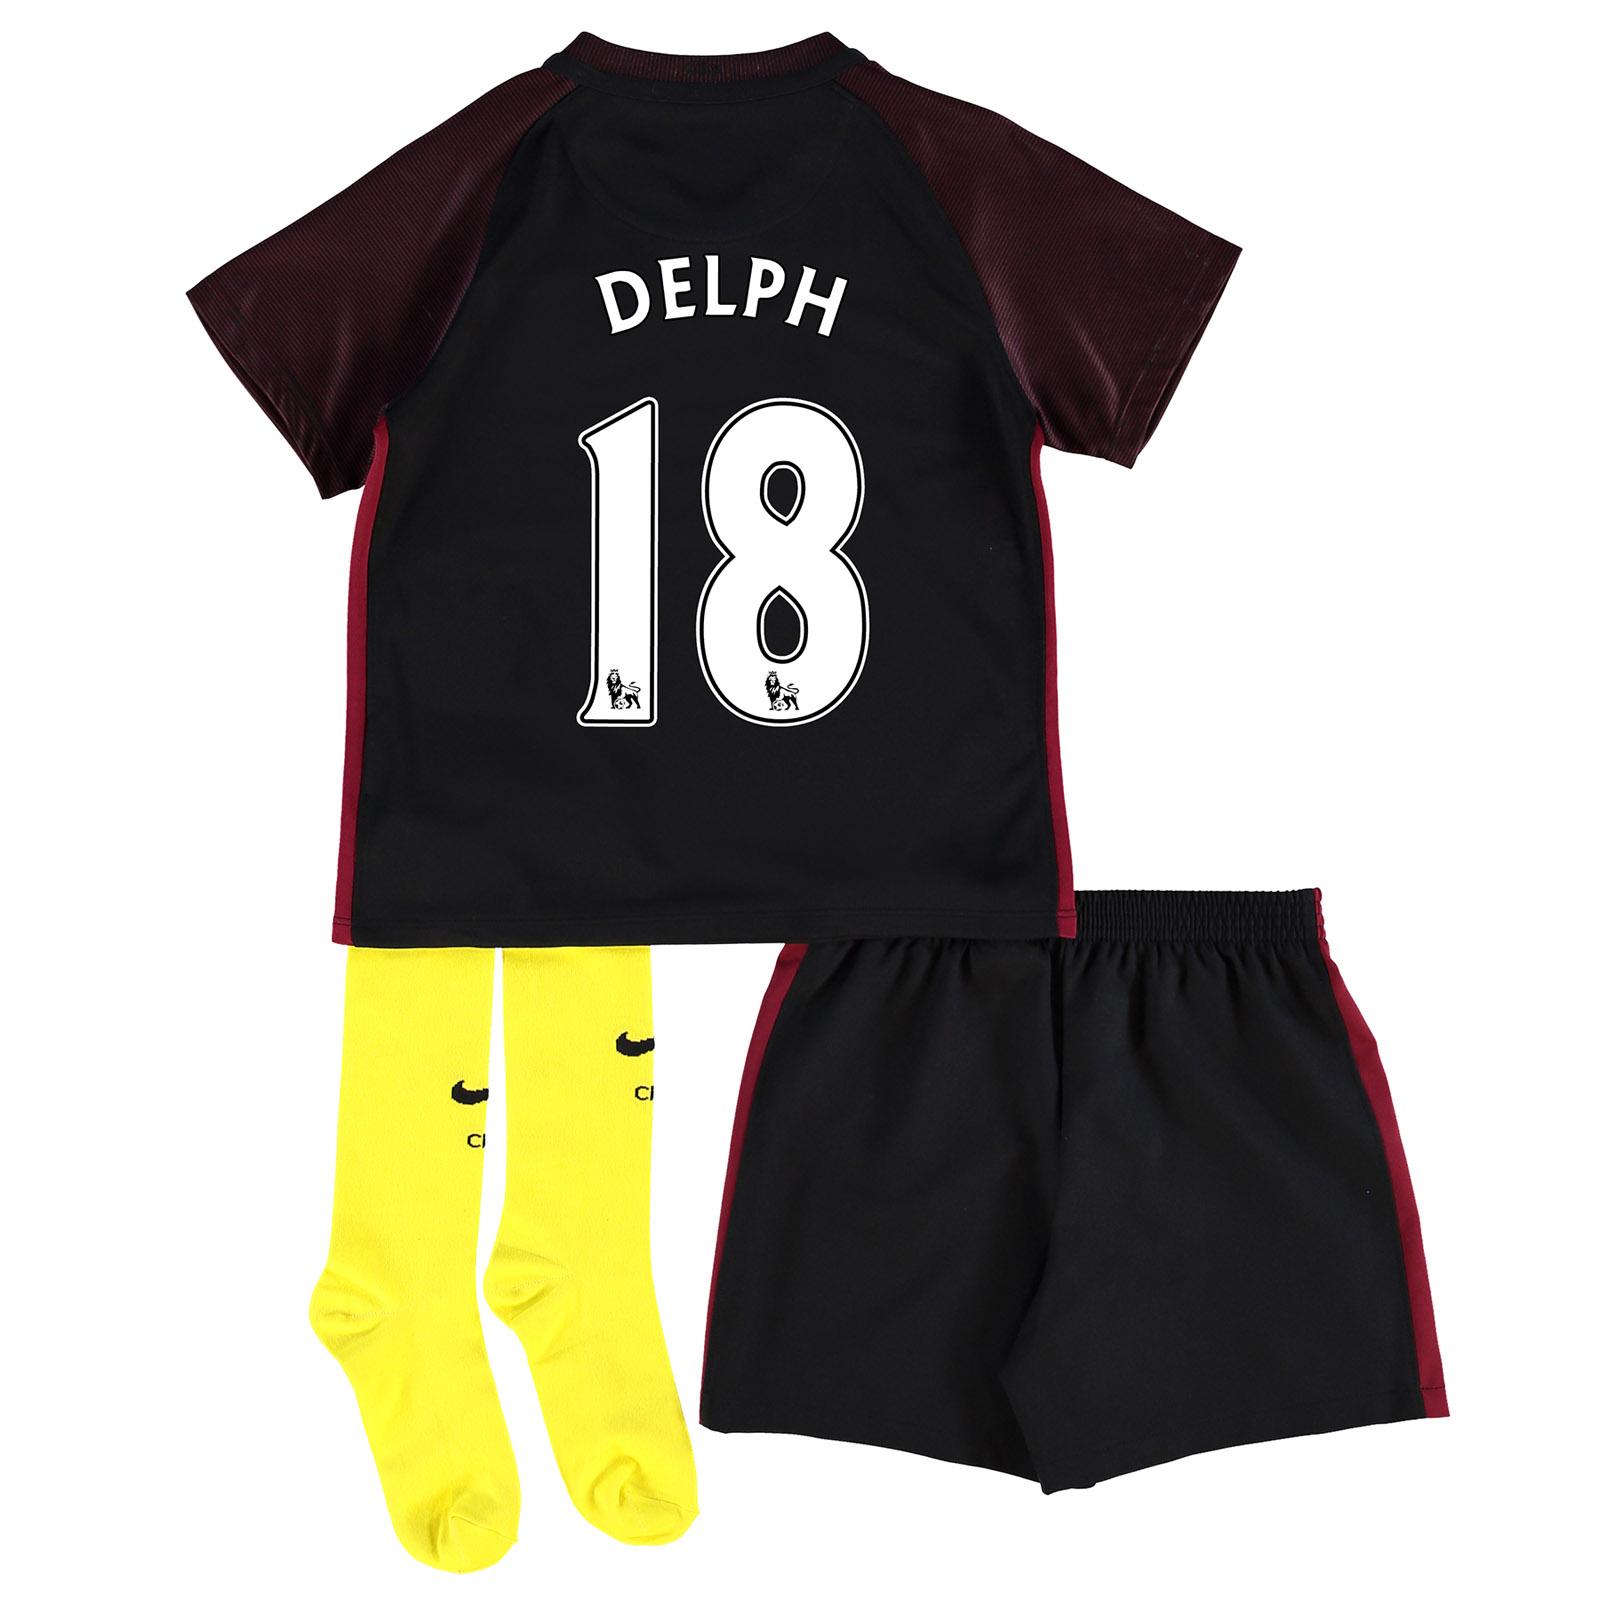 Manchester City Away Stadium Kit 2016-17 - Little Kids with Delph 18 p